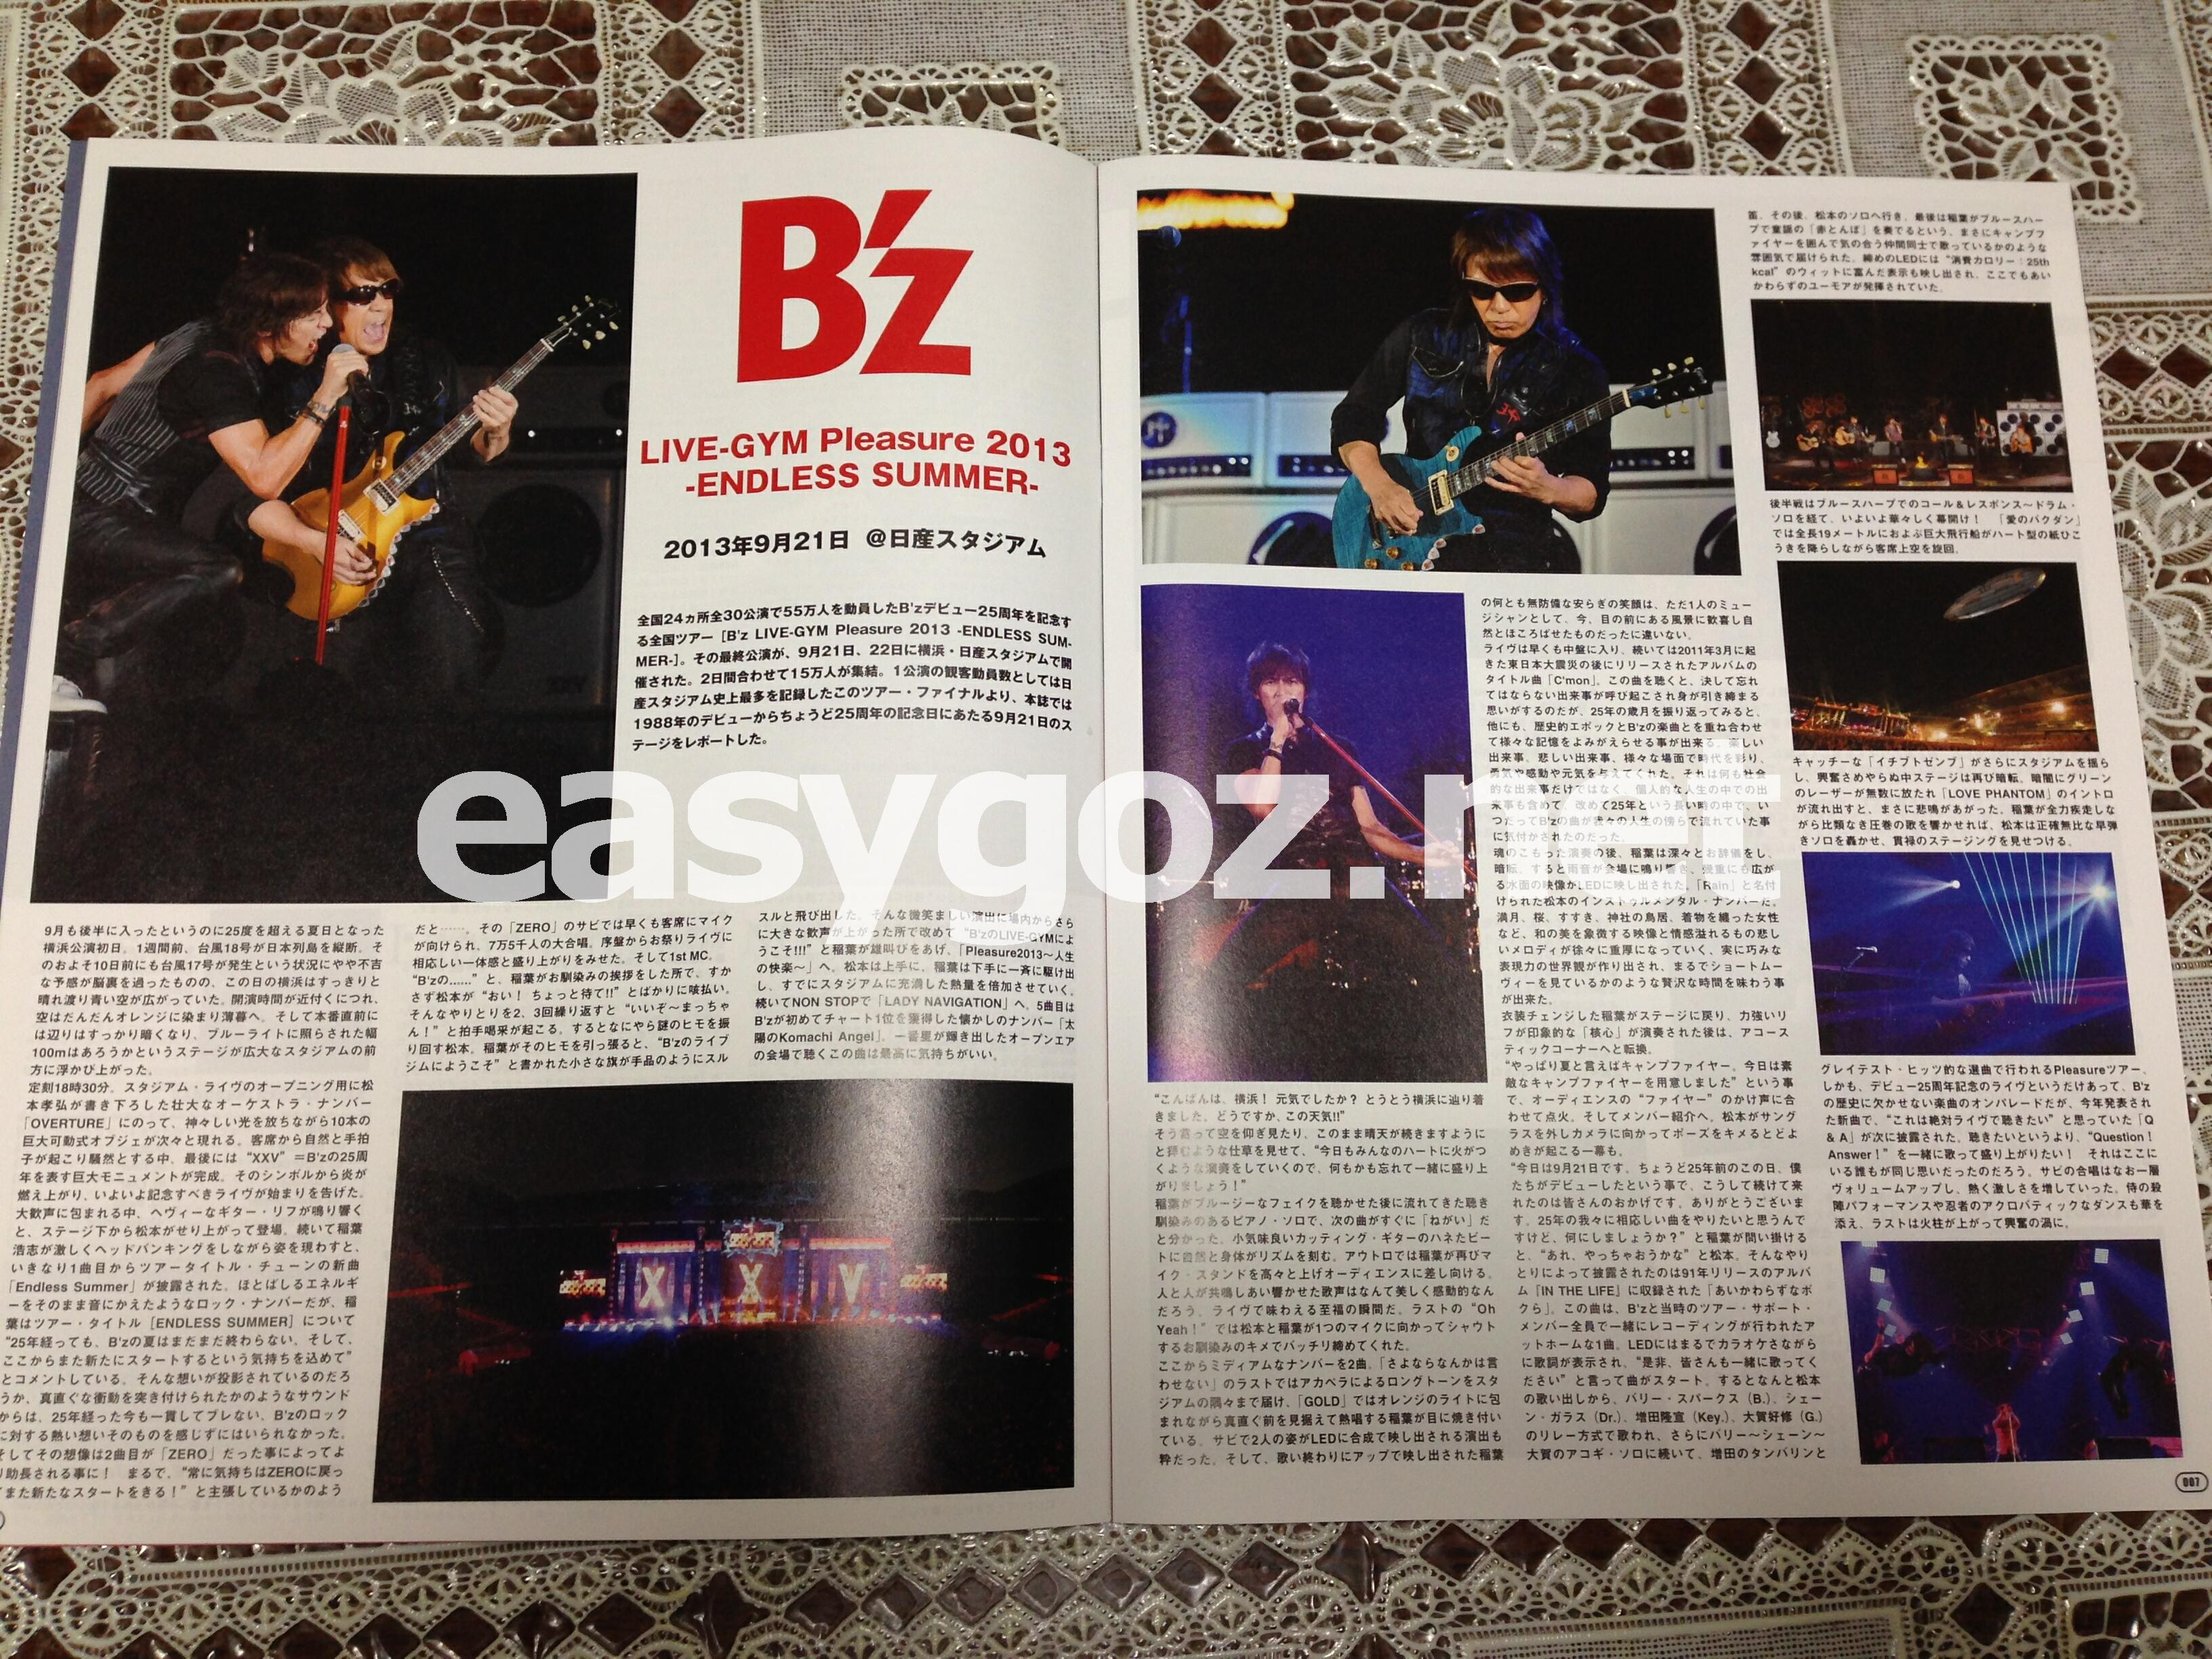 music freak ES 2013年10月号にB'z日産スタジアム ライブレポ掲載